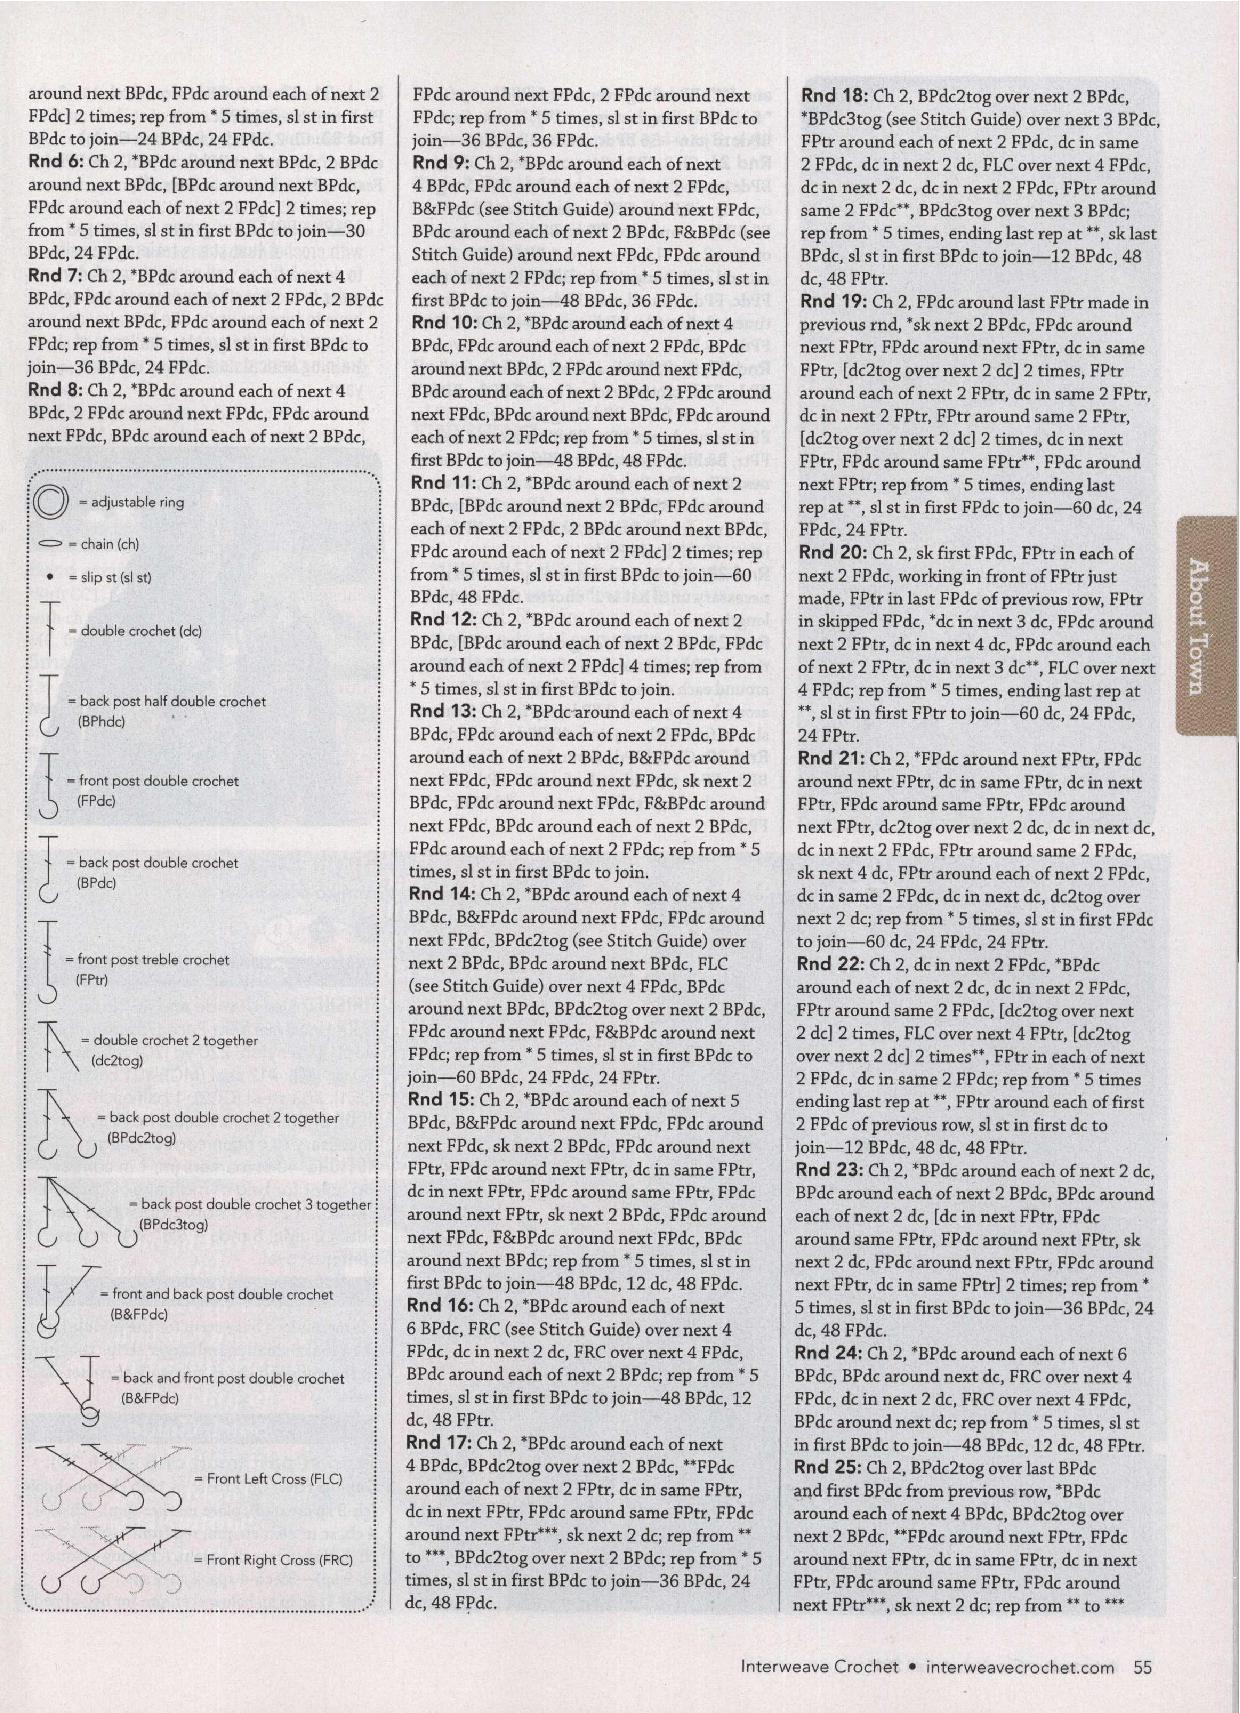 Page_00042.jpg